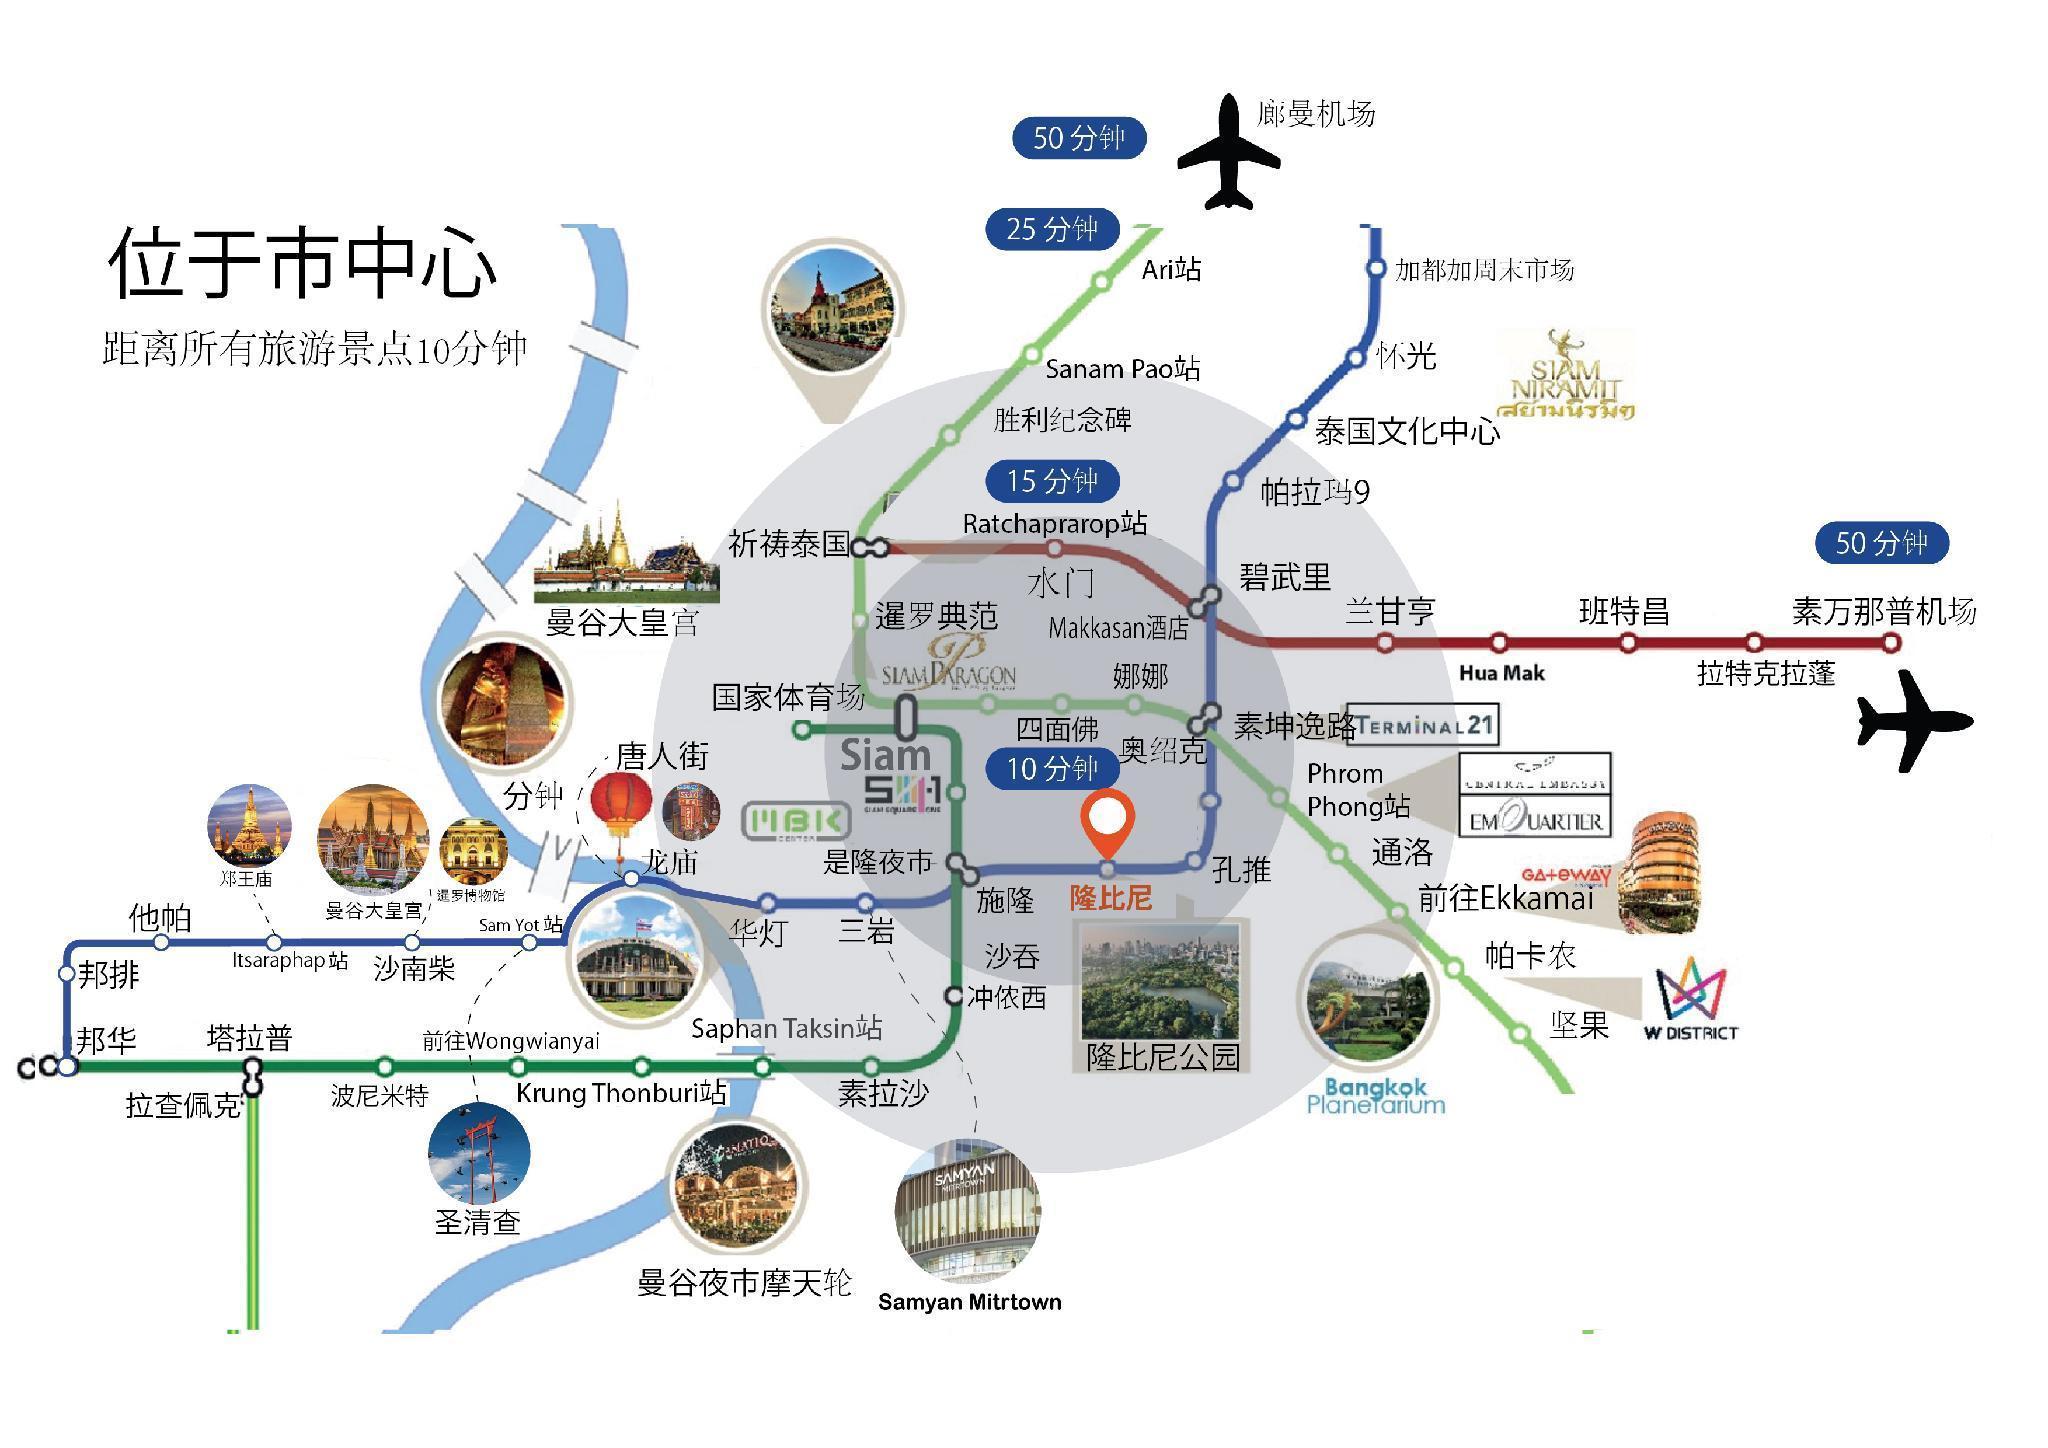 BKK Forest- 2 baths for 6 people near metro+TOUR BKK Forest- 2 baths for 6 people near metro+TOUR